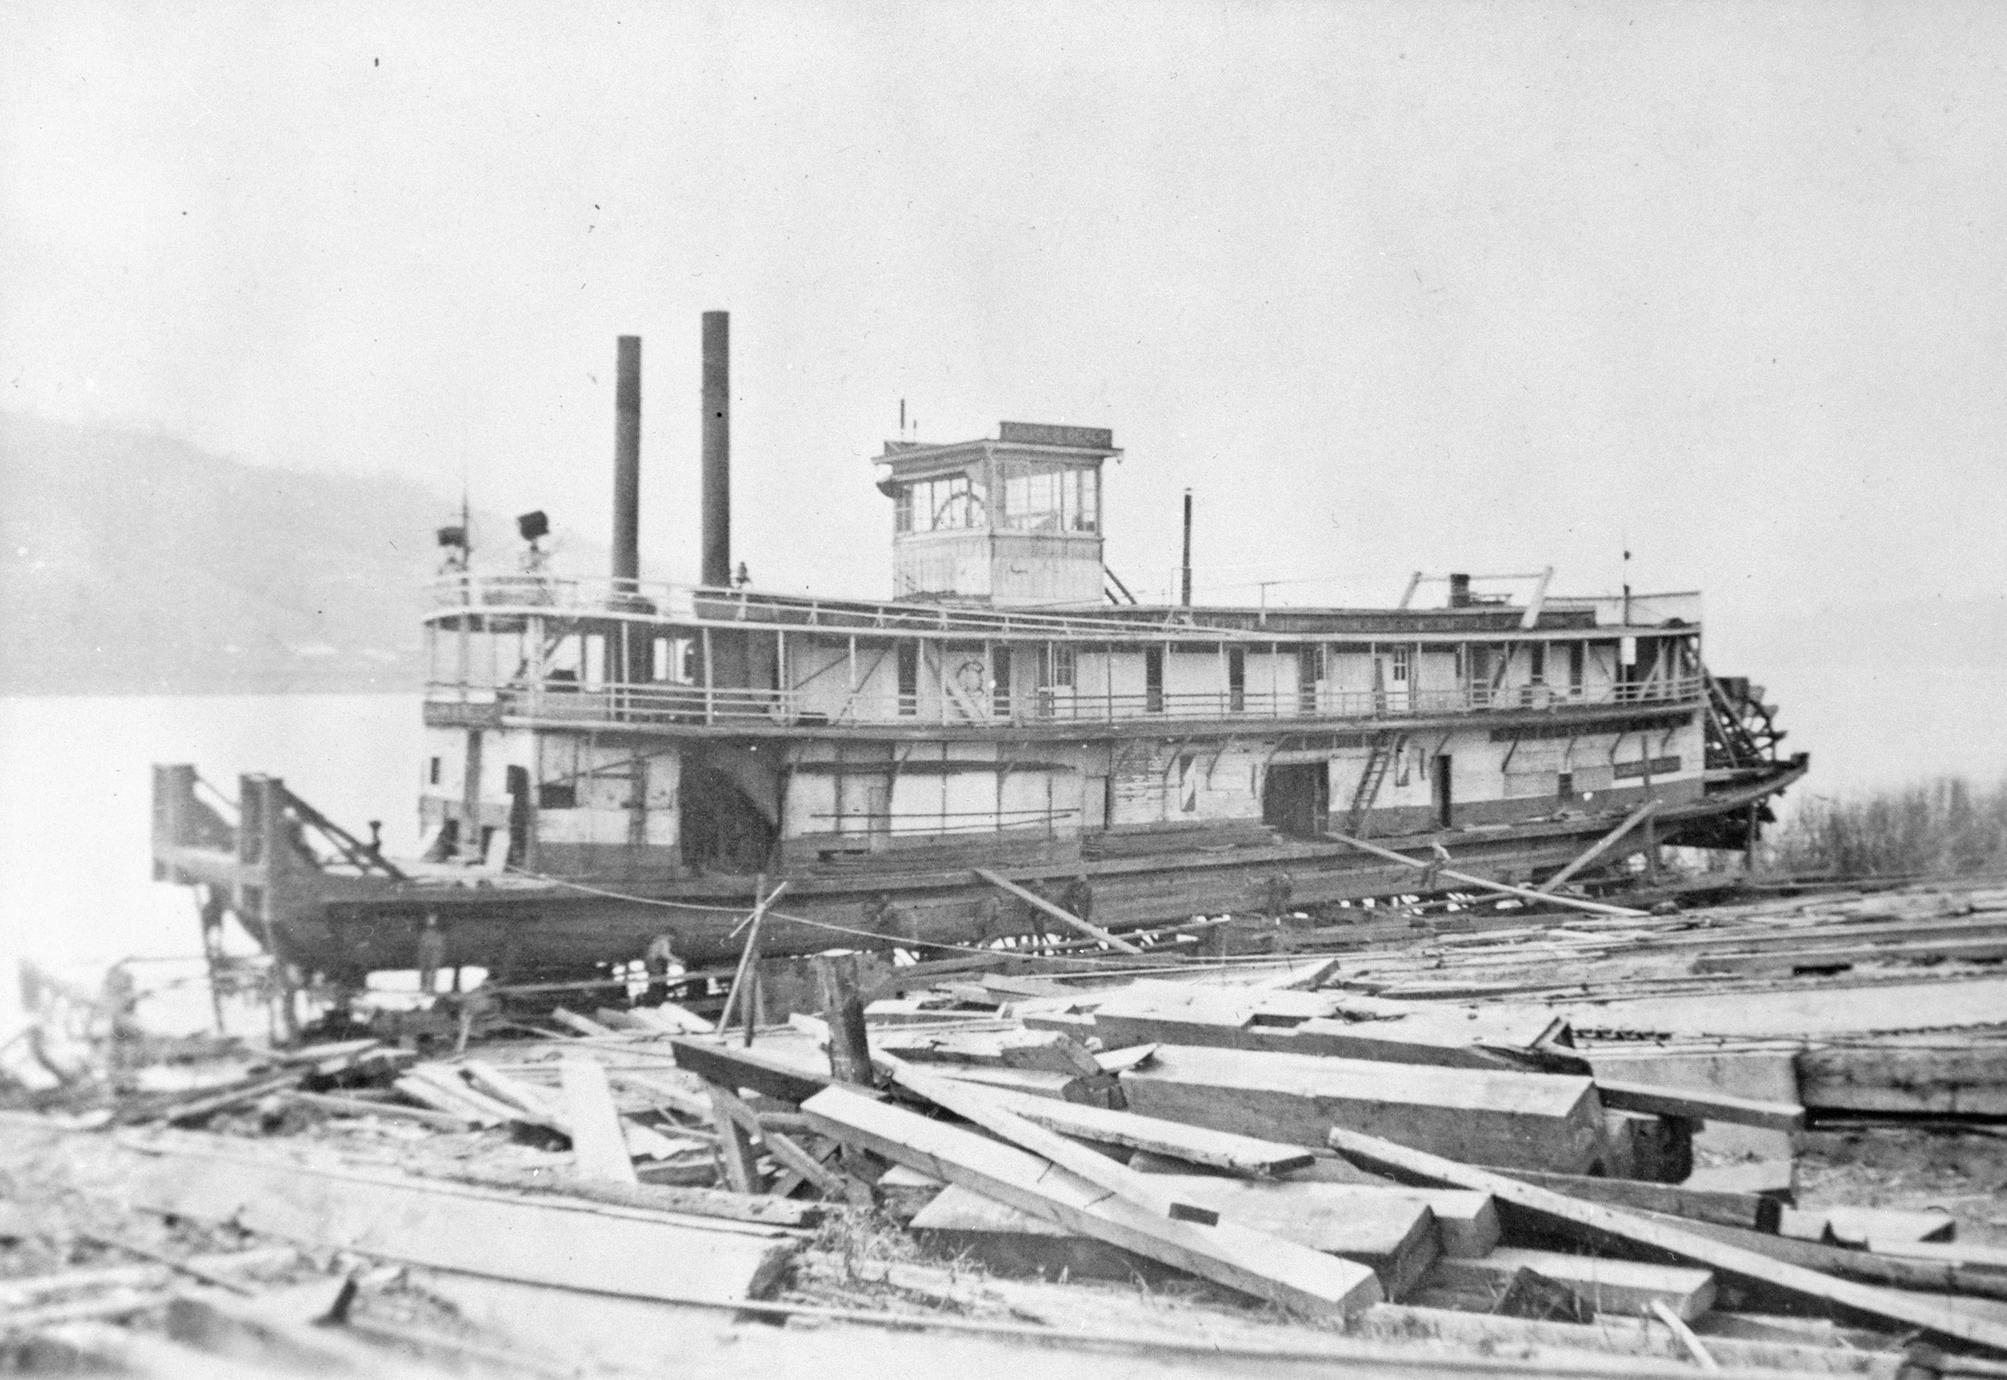 Calvin B. Beach (Towboat, 1935-1939)